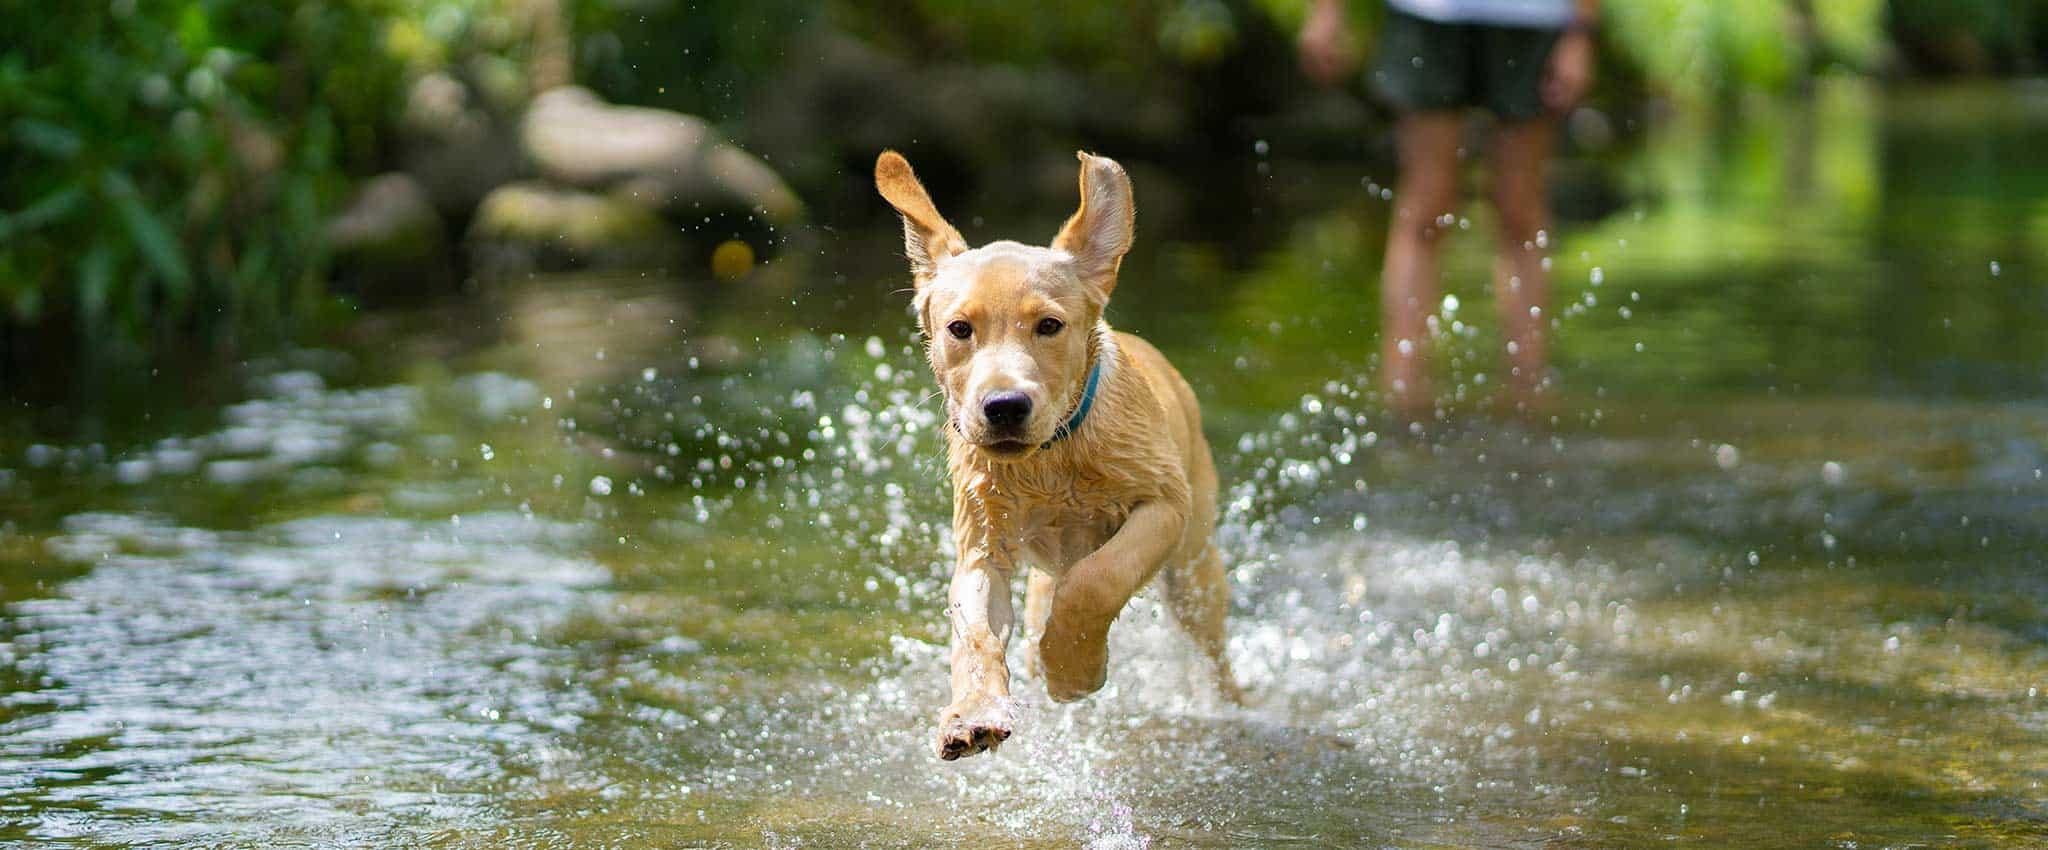 A dog running in a stream